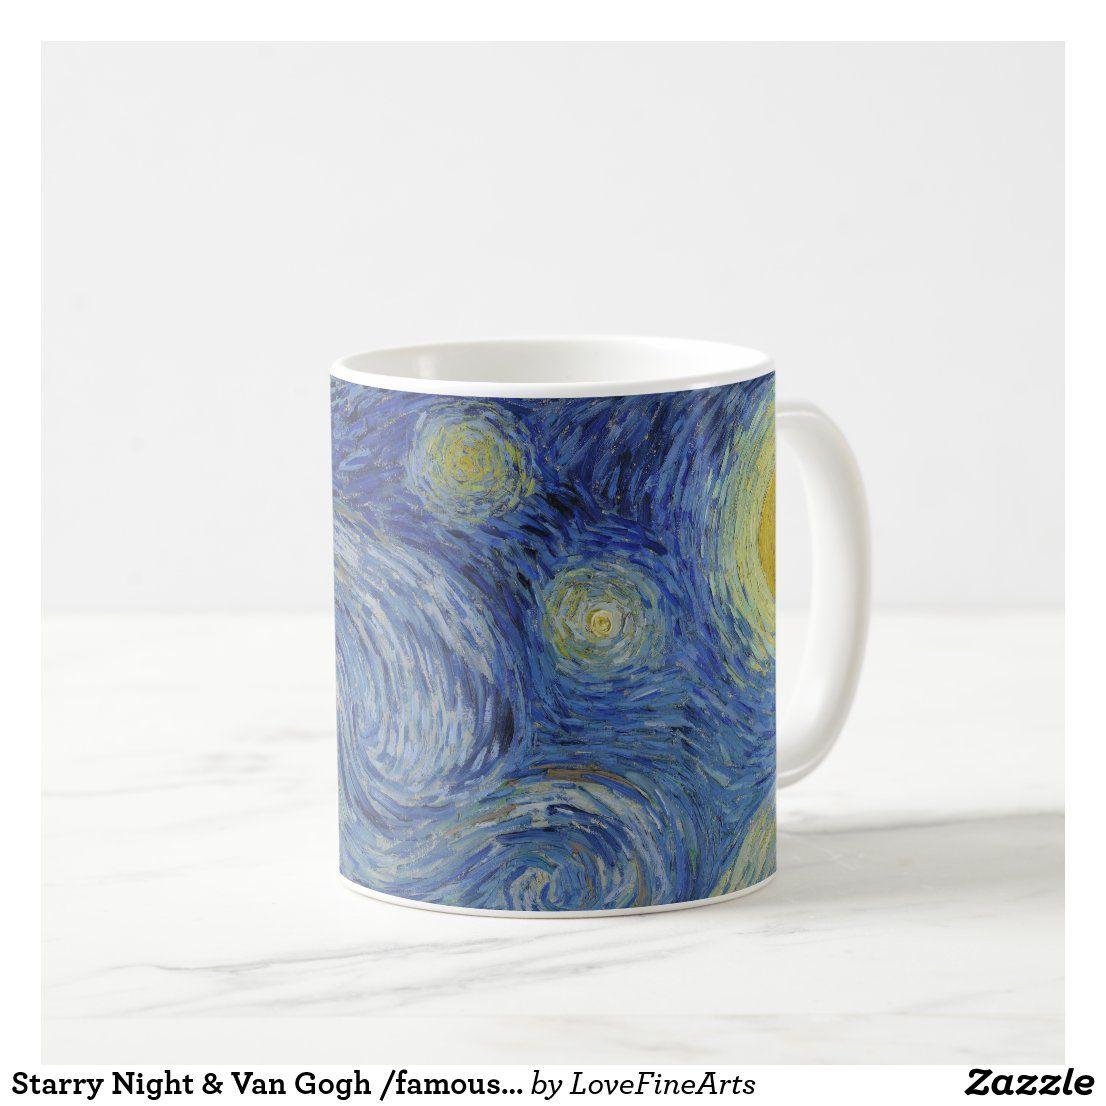 Starry Night Van Gogh Famous Vintage Art Coffee Mug Zazzle Com In 2021 Starry Night Van Gogh Vintage Art Starry Night Painting